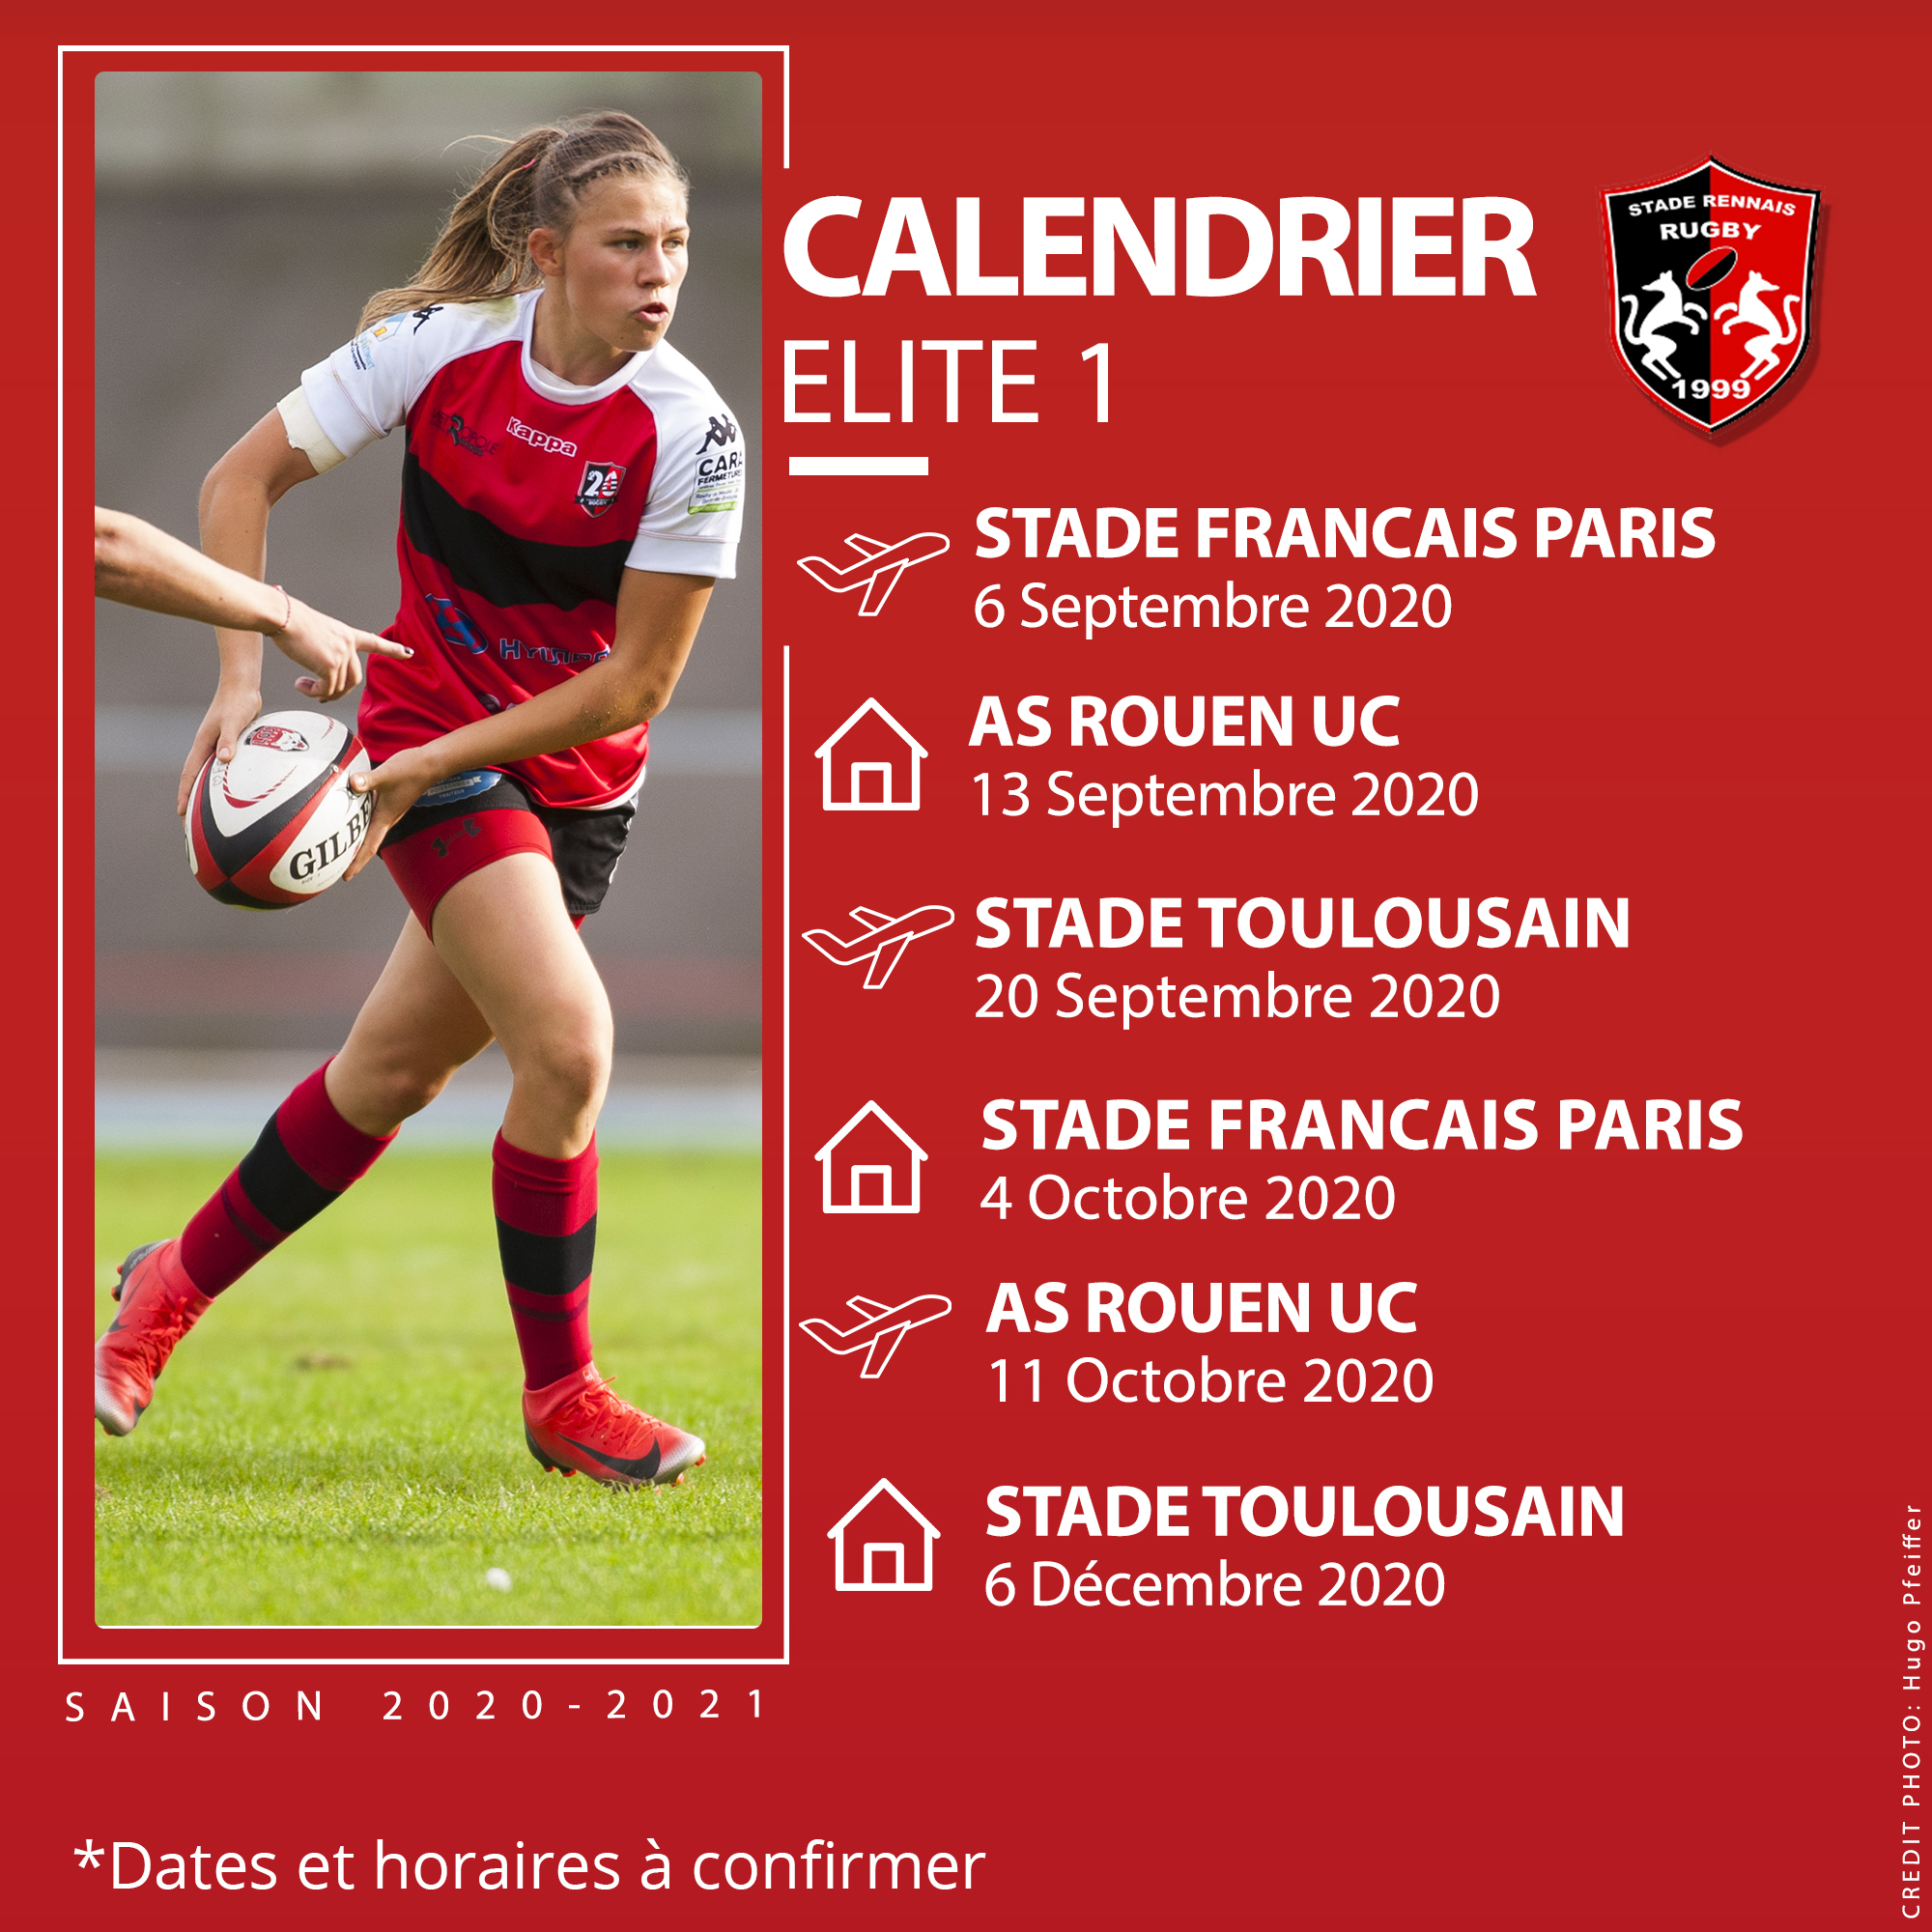 Calendrier Elite 1 - Saison 2020-2021